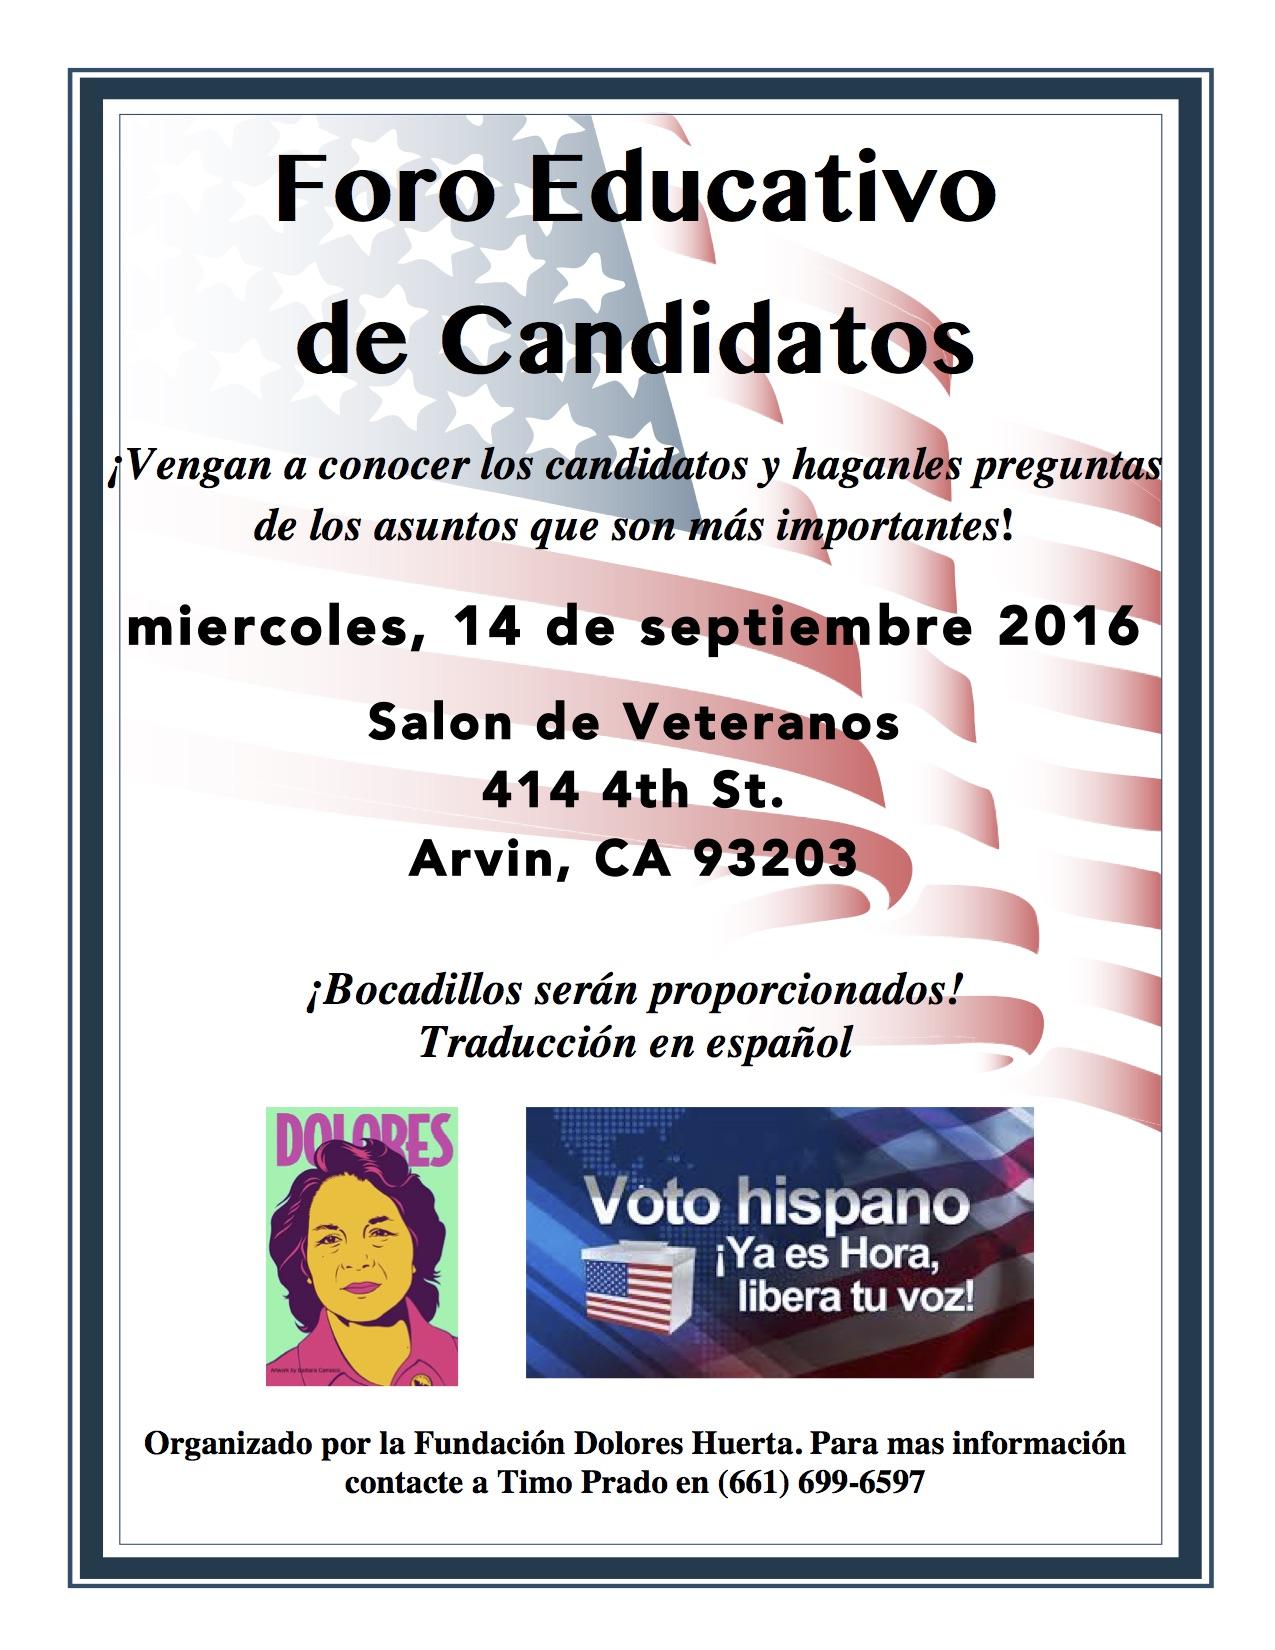 Foro de Candidatos Arvin 9-14-16